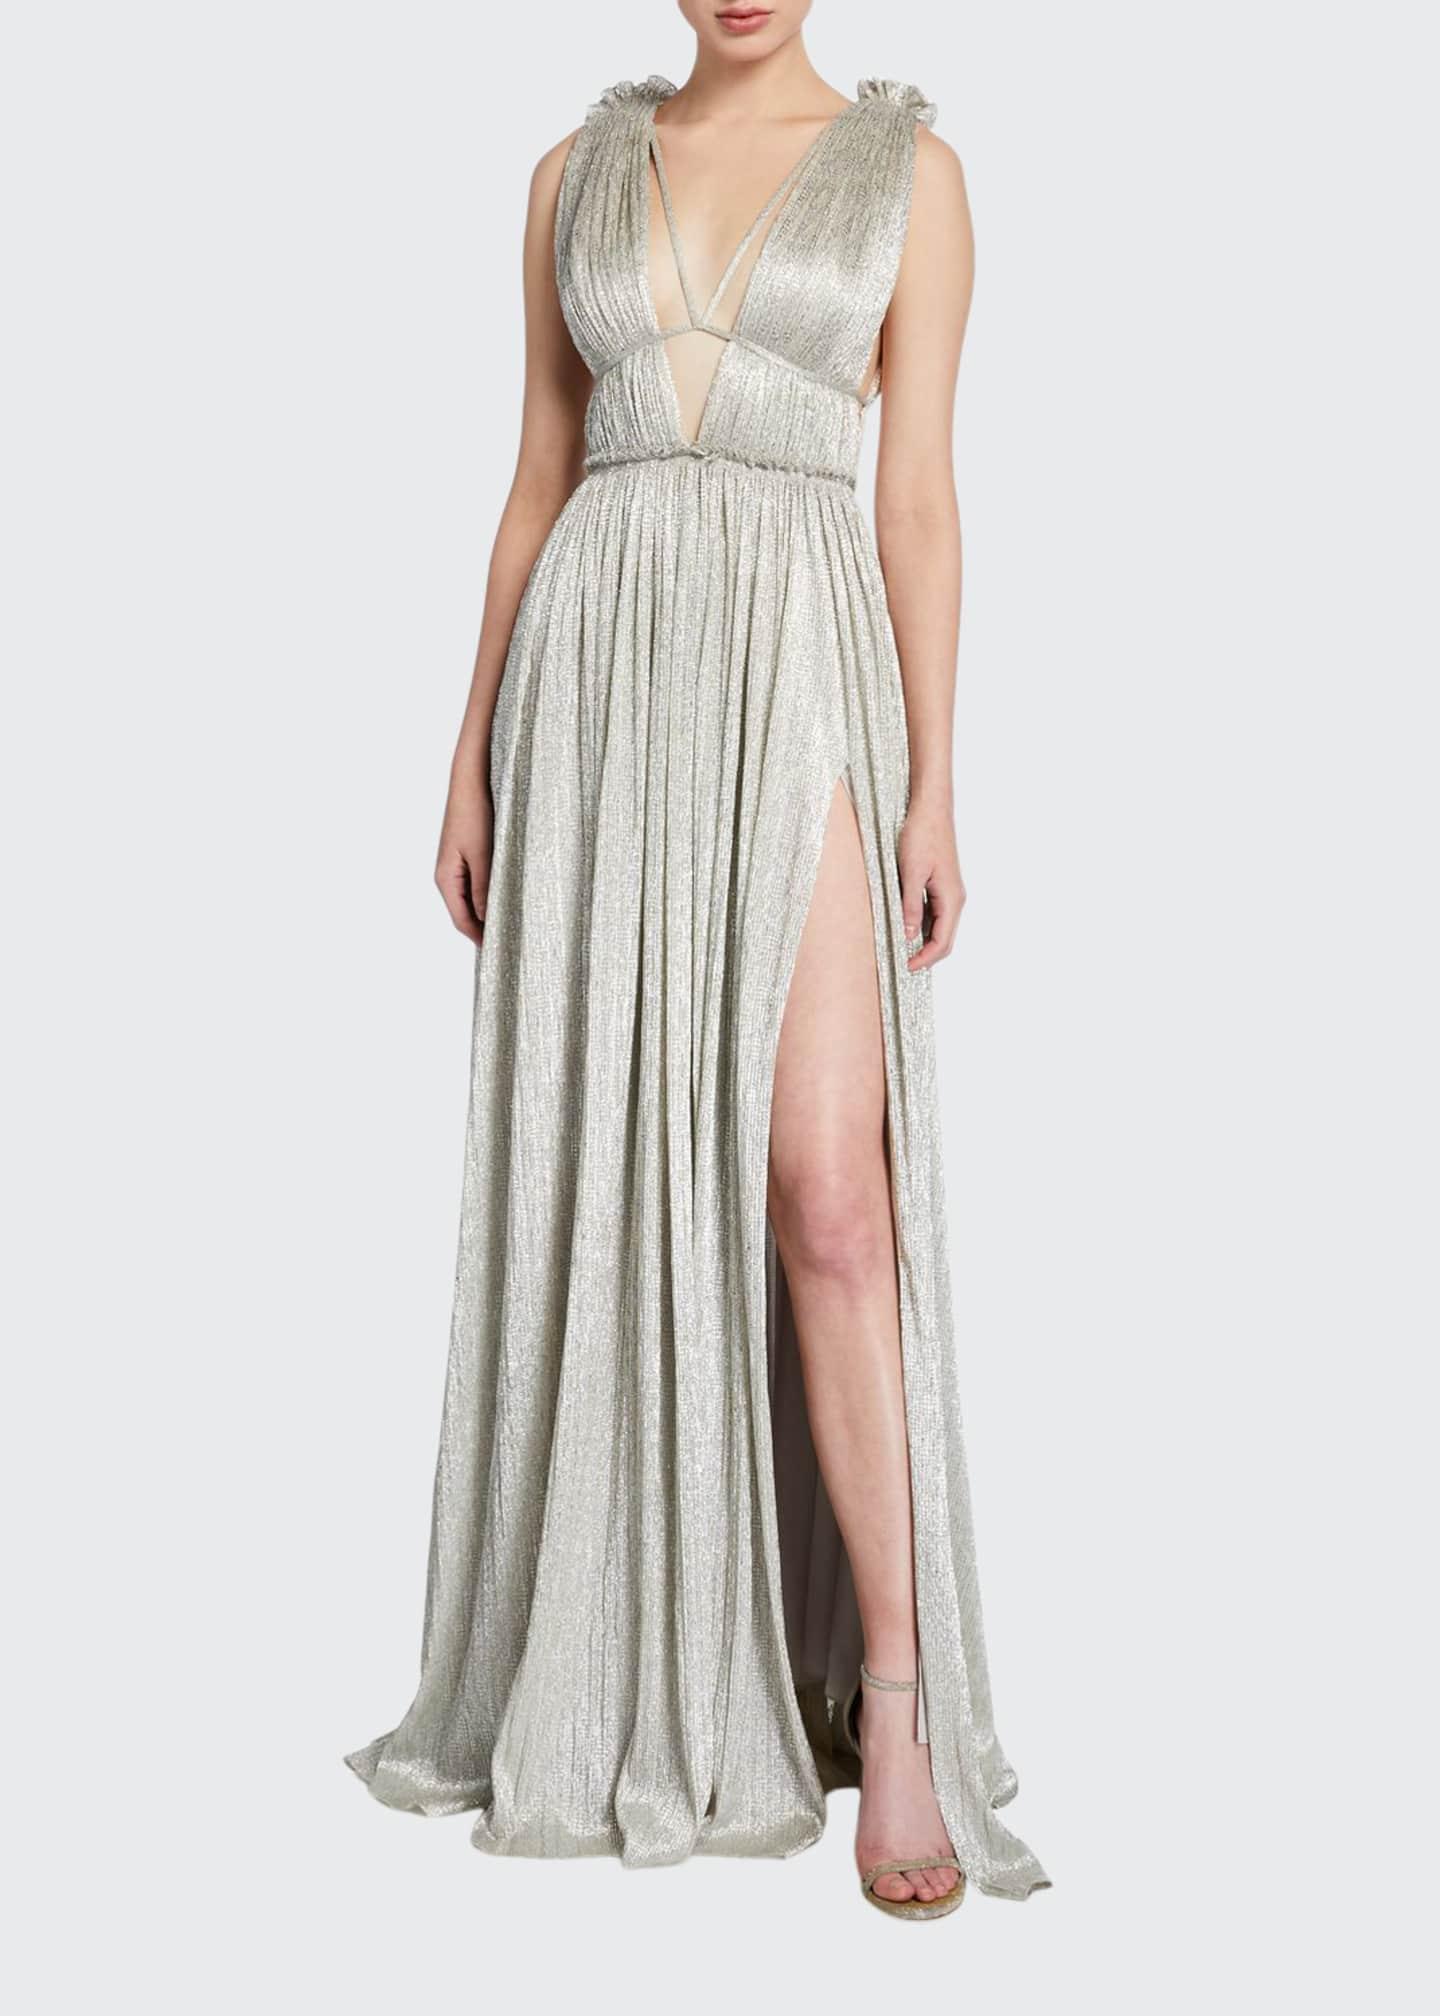 Jonathan Simkhai Plisse Metallic Plunging Maxi Dress